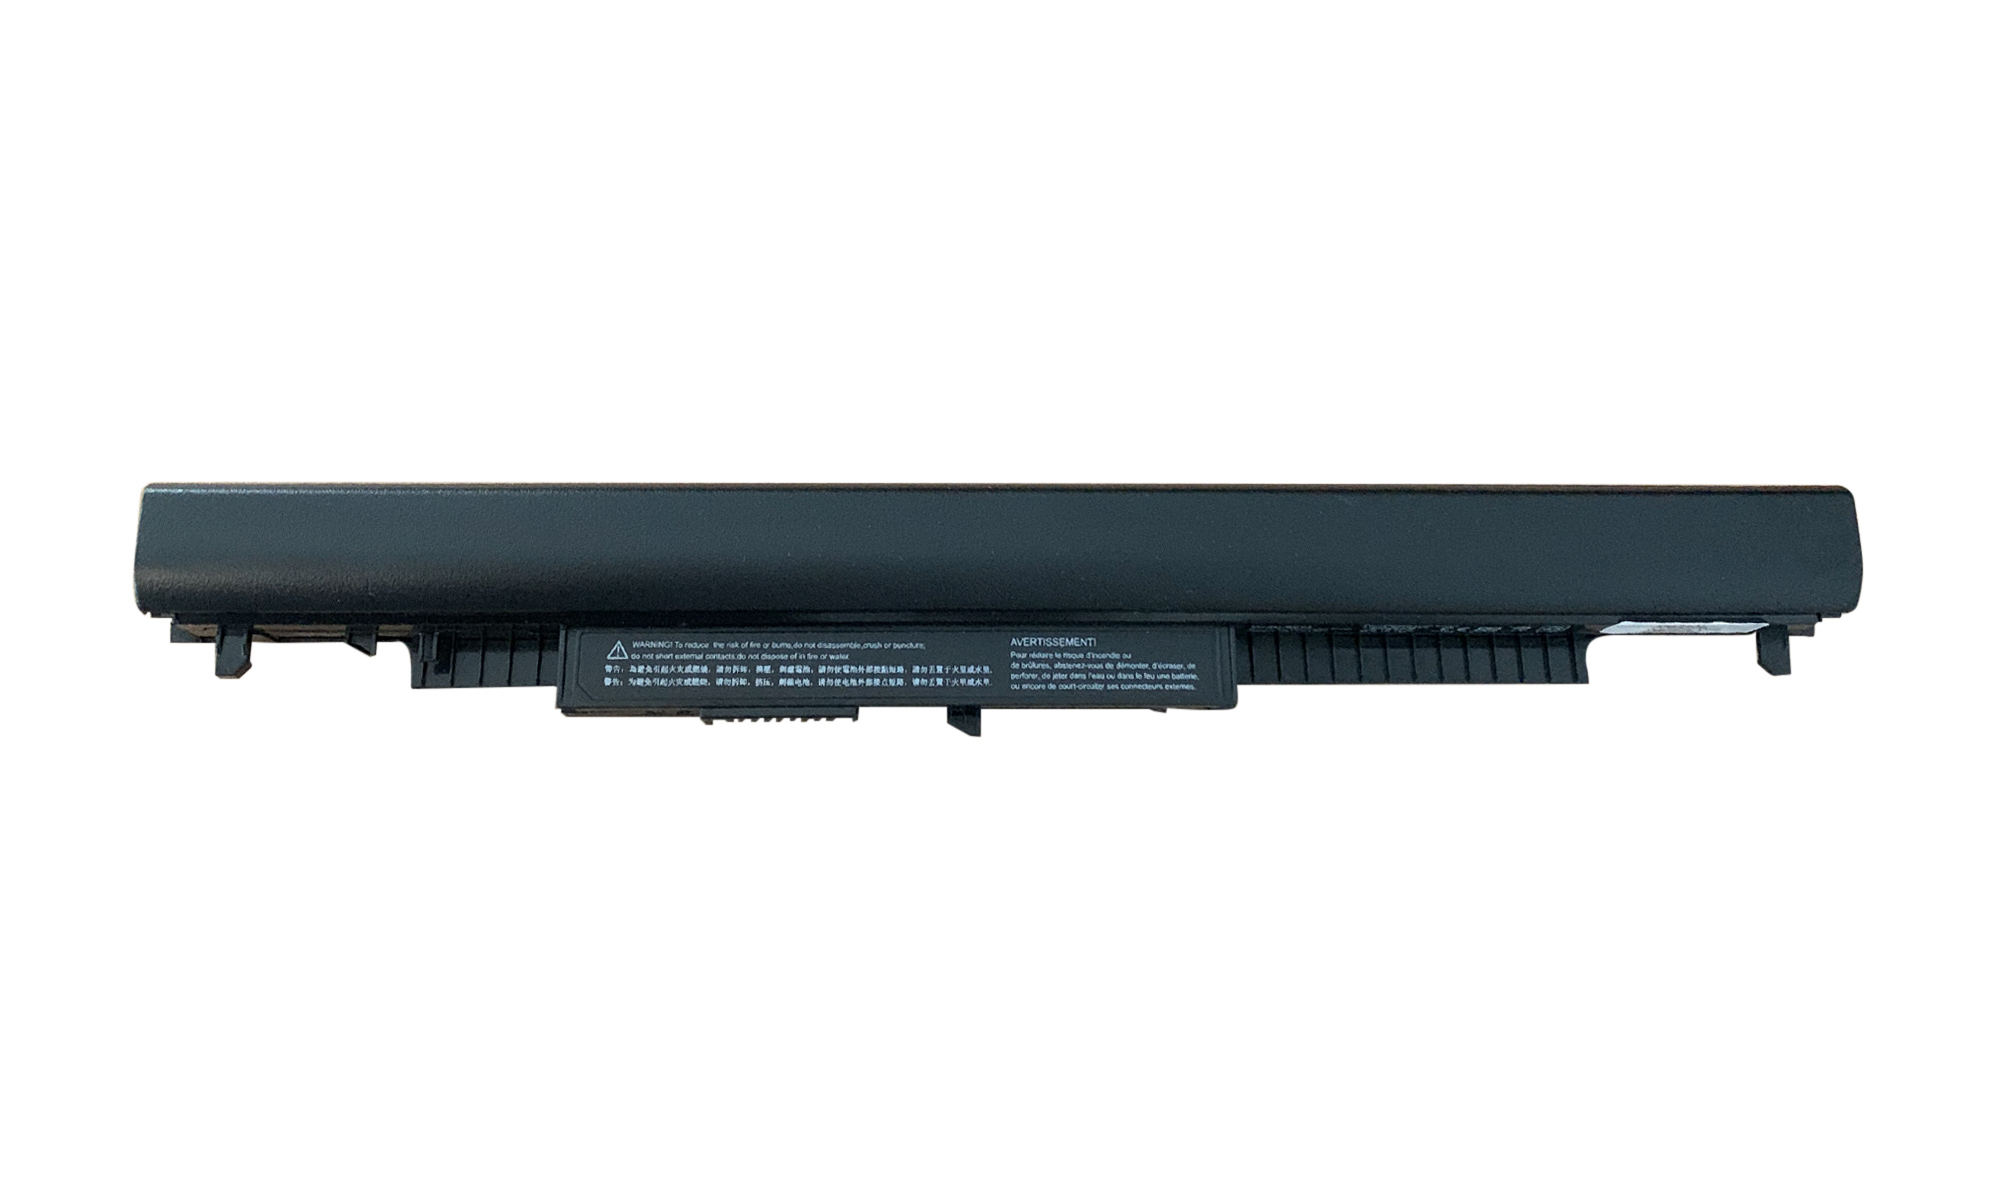 Baterie compatibila HP 807957-001, HS04, HSTNN-LB6V 807956-001 HSTNN-LB6U 2200mAh 33Wh